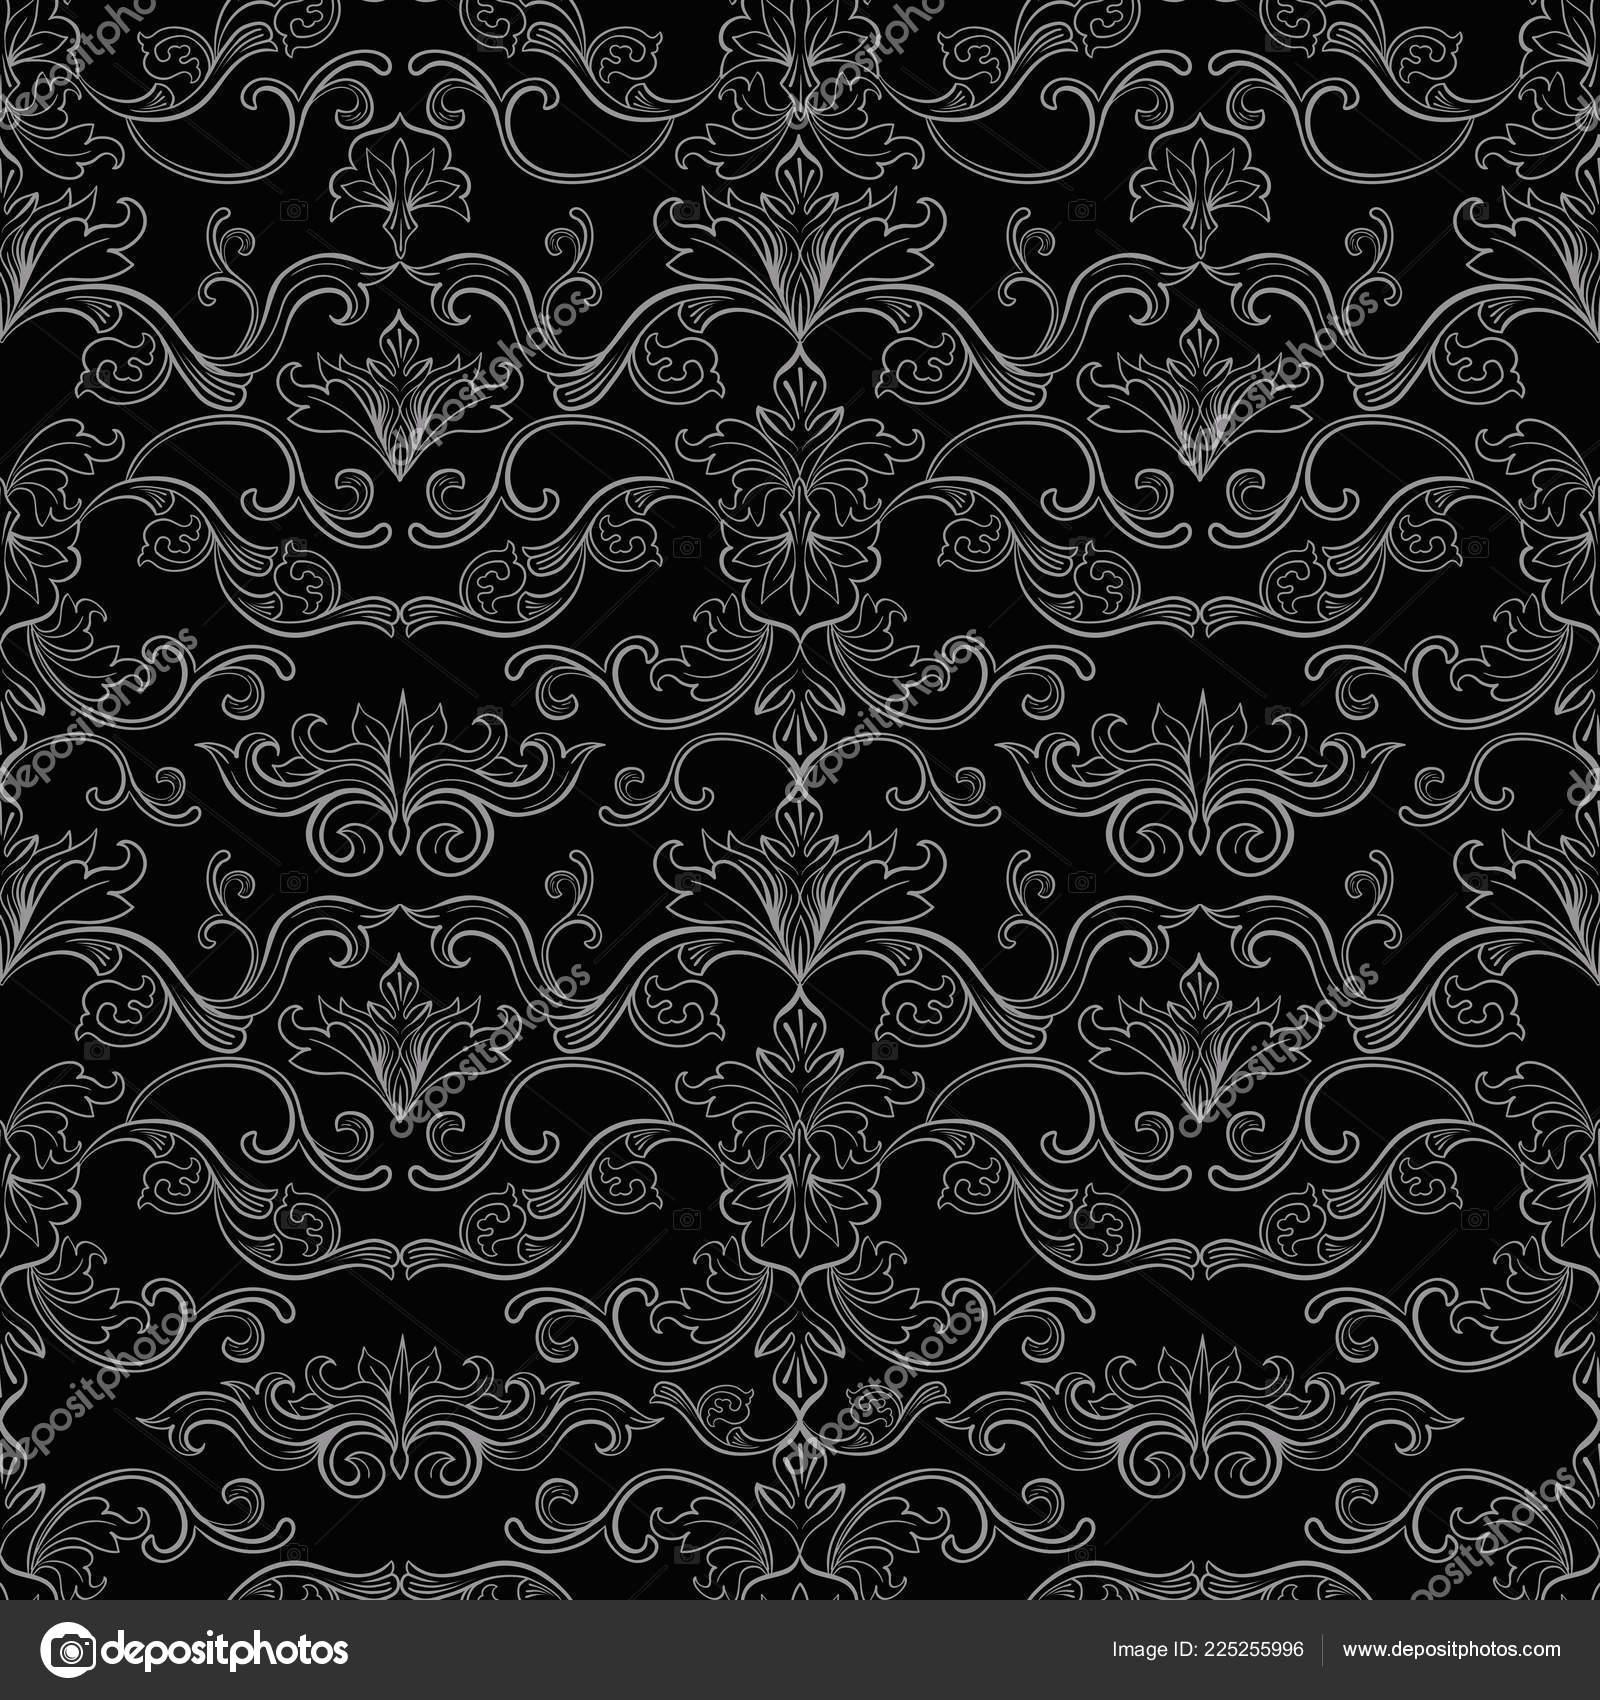 Damask Vector Seamless Pattern Vintage Style Wallpaper